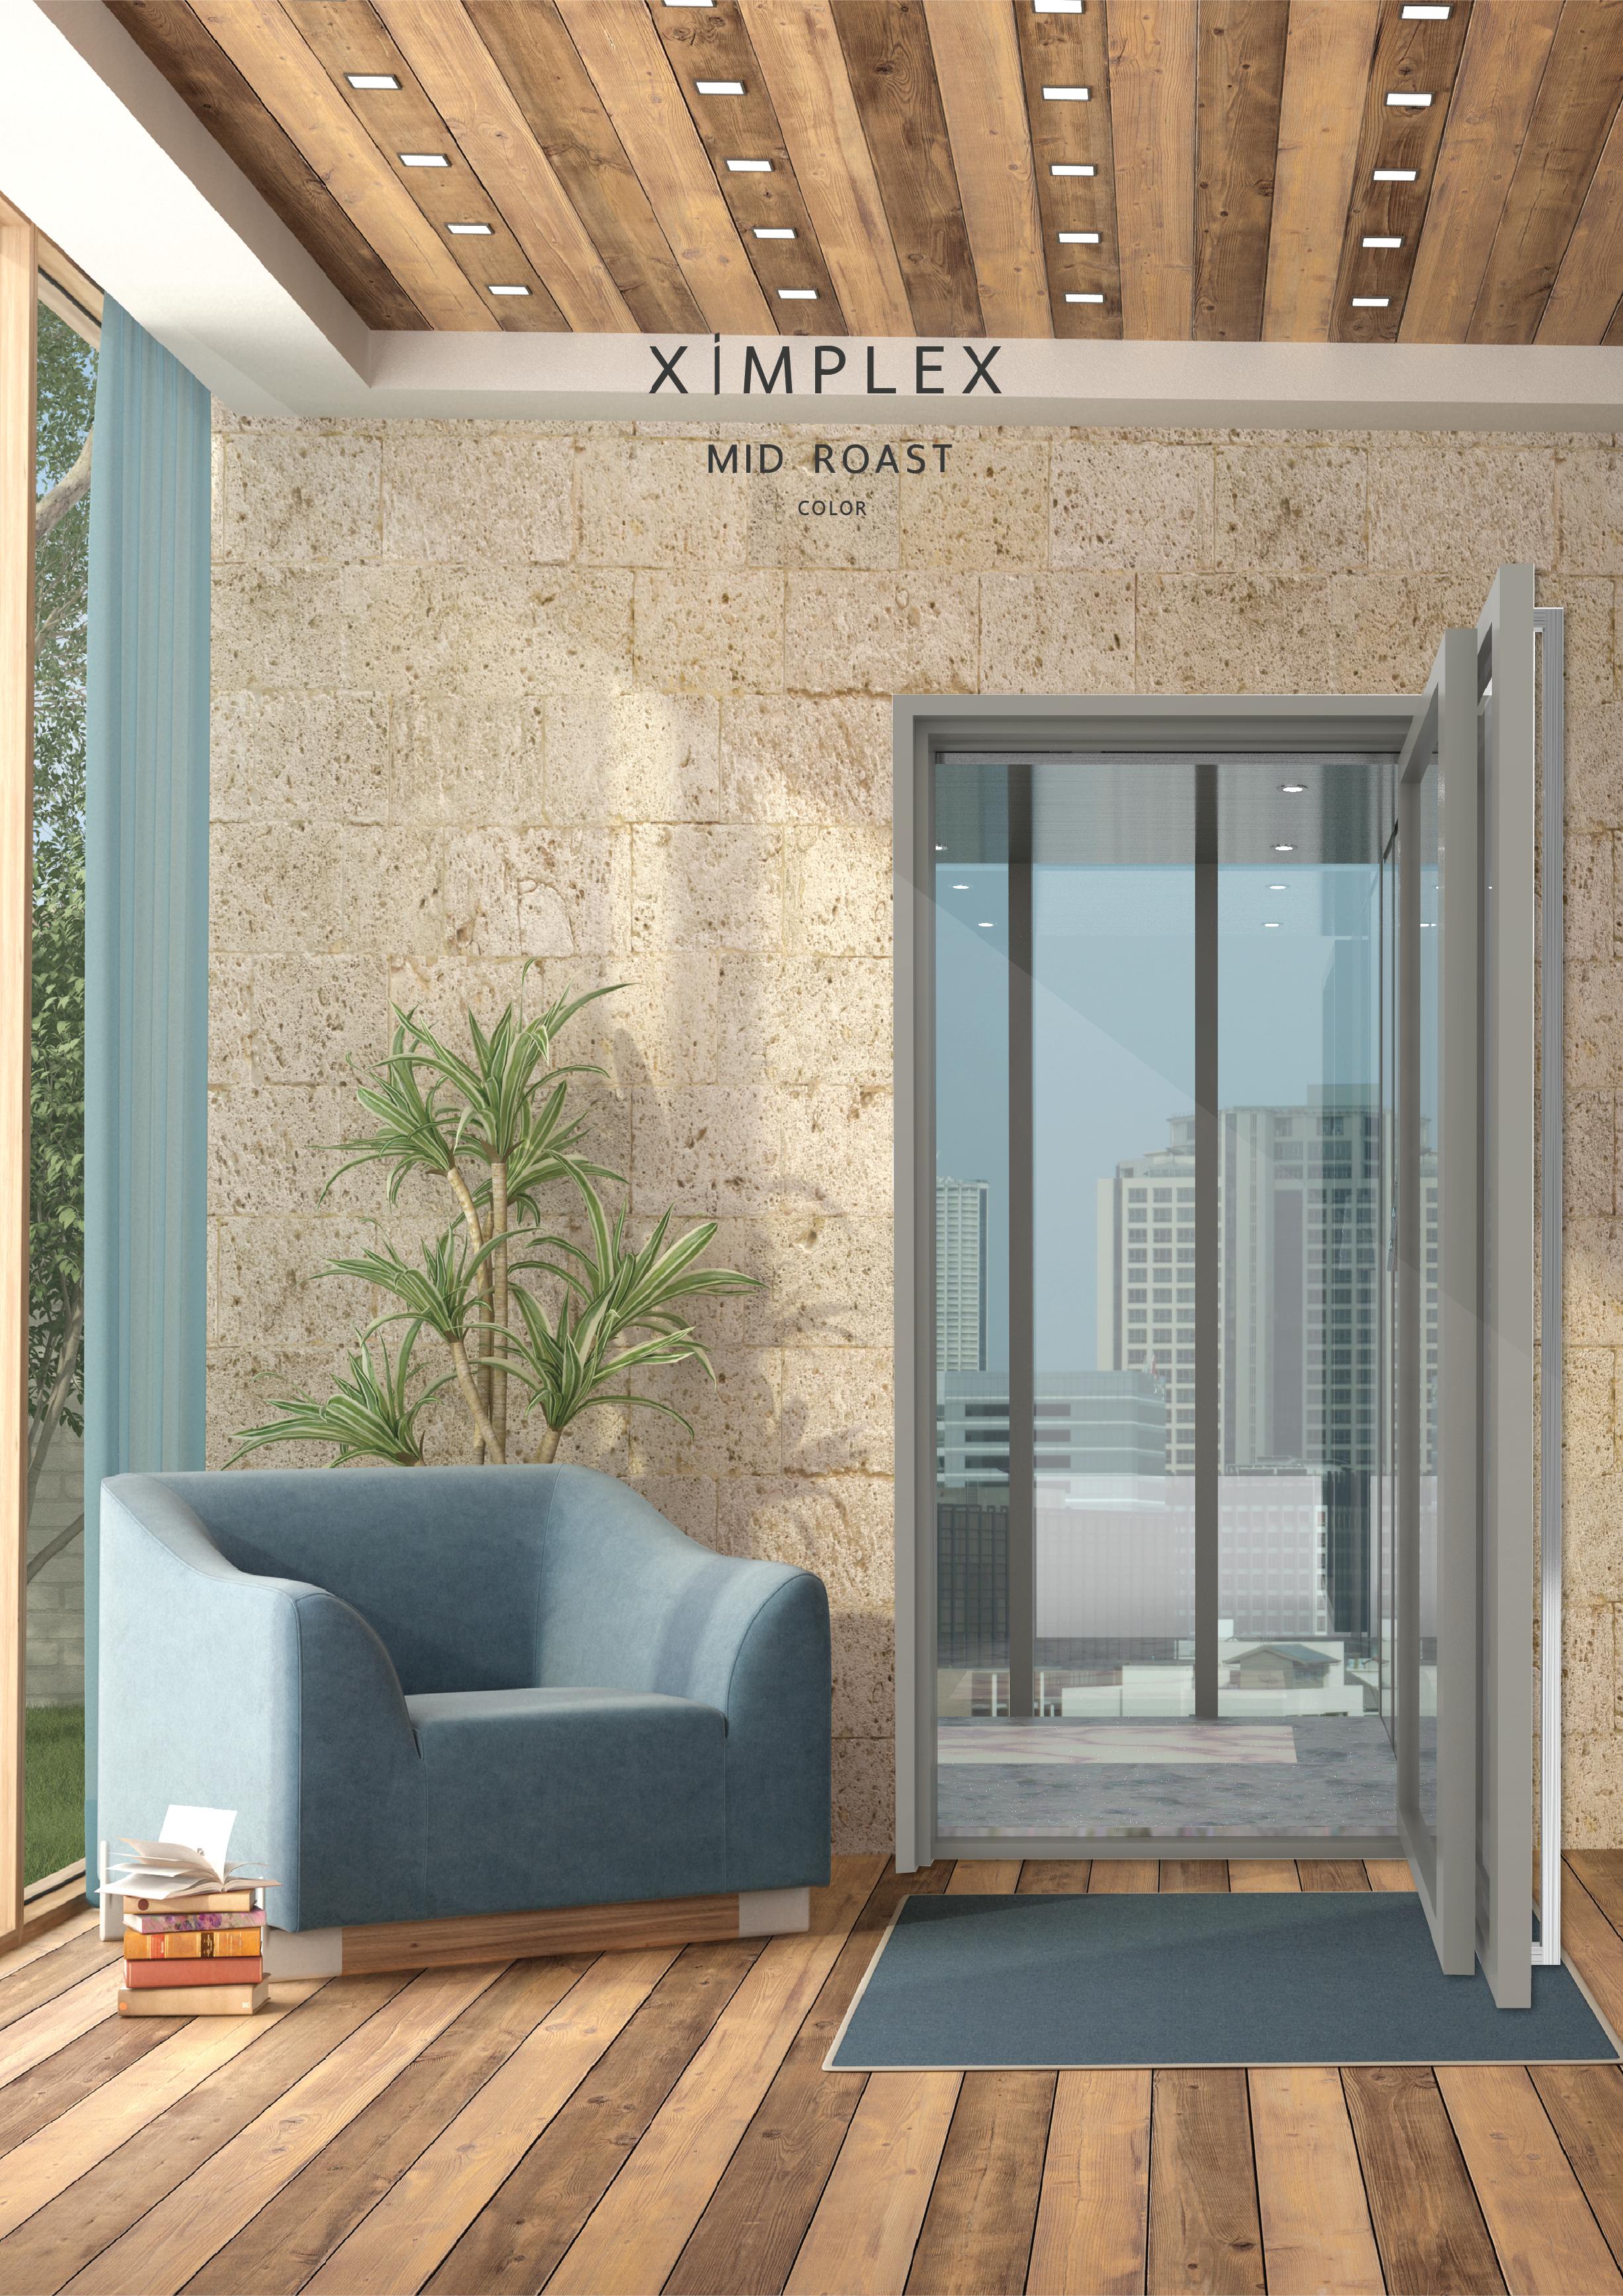 Ximplex Home Lift Home Elevator Ximplex ลิฟต์บ้าน ลิฟท์บ้าน Mid roast design